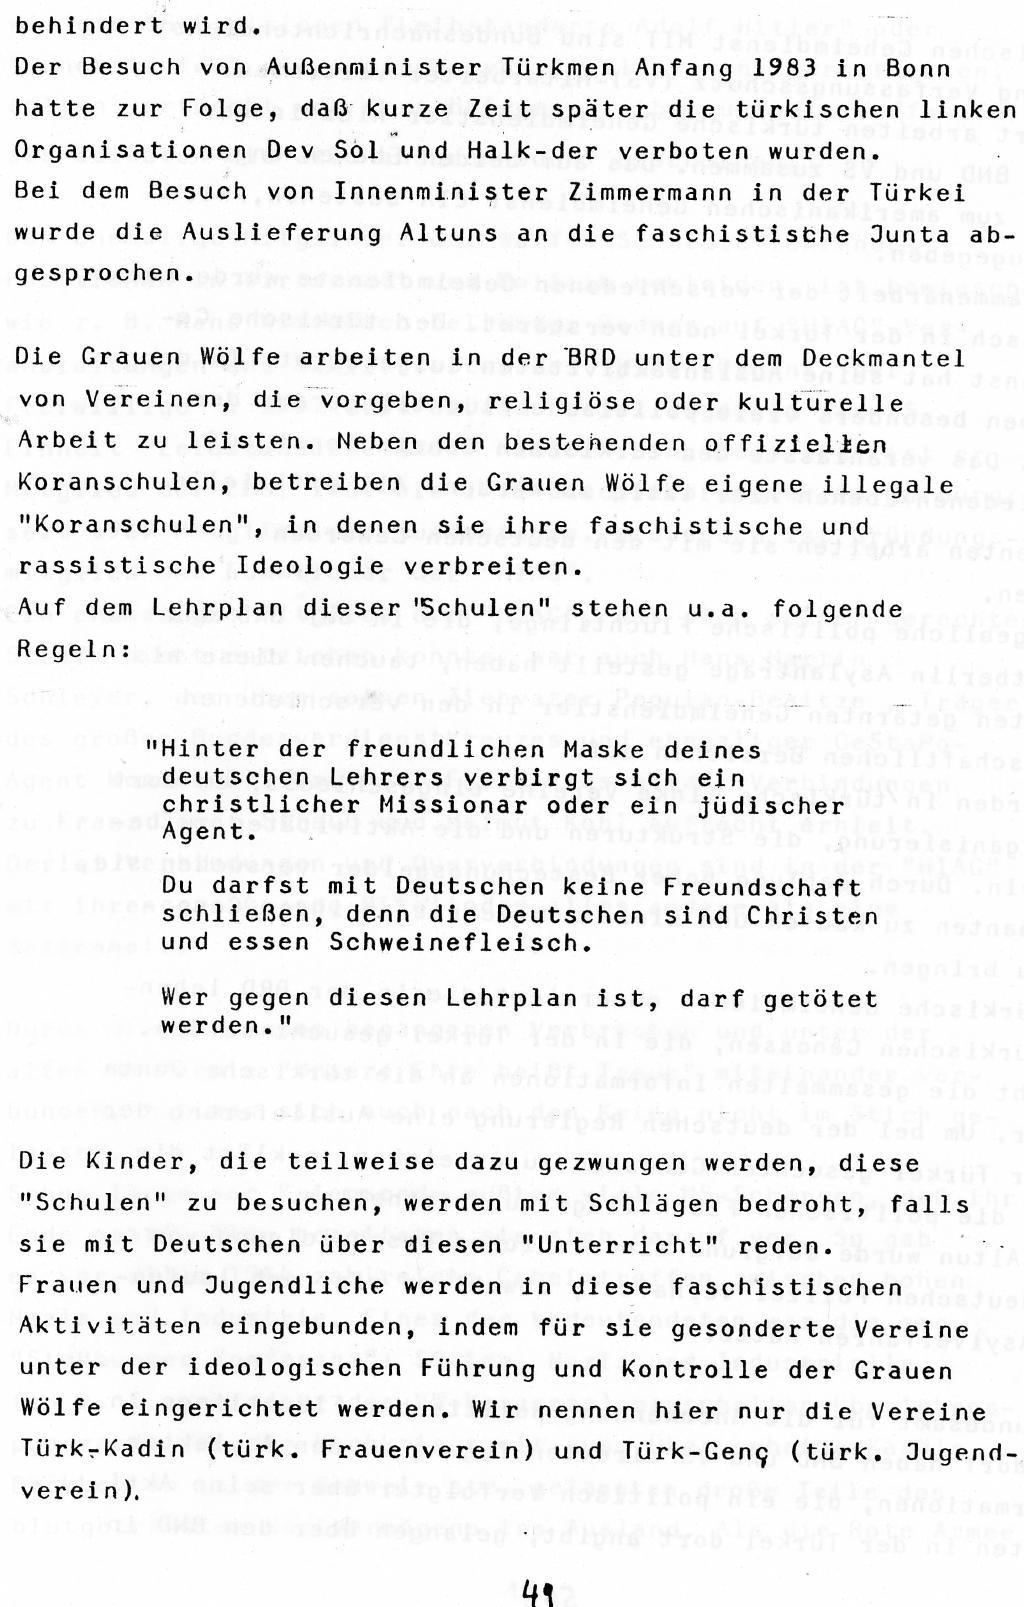 Berlin_1983_Autonome_Gruppen_Faschismus_im_Kapitalismus_49